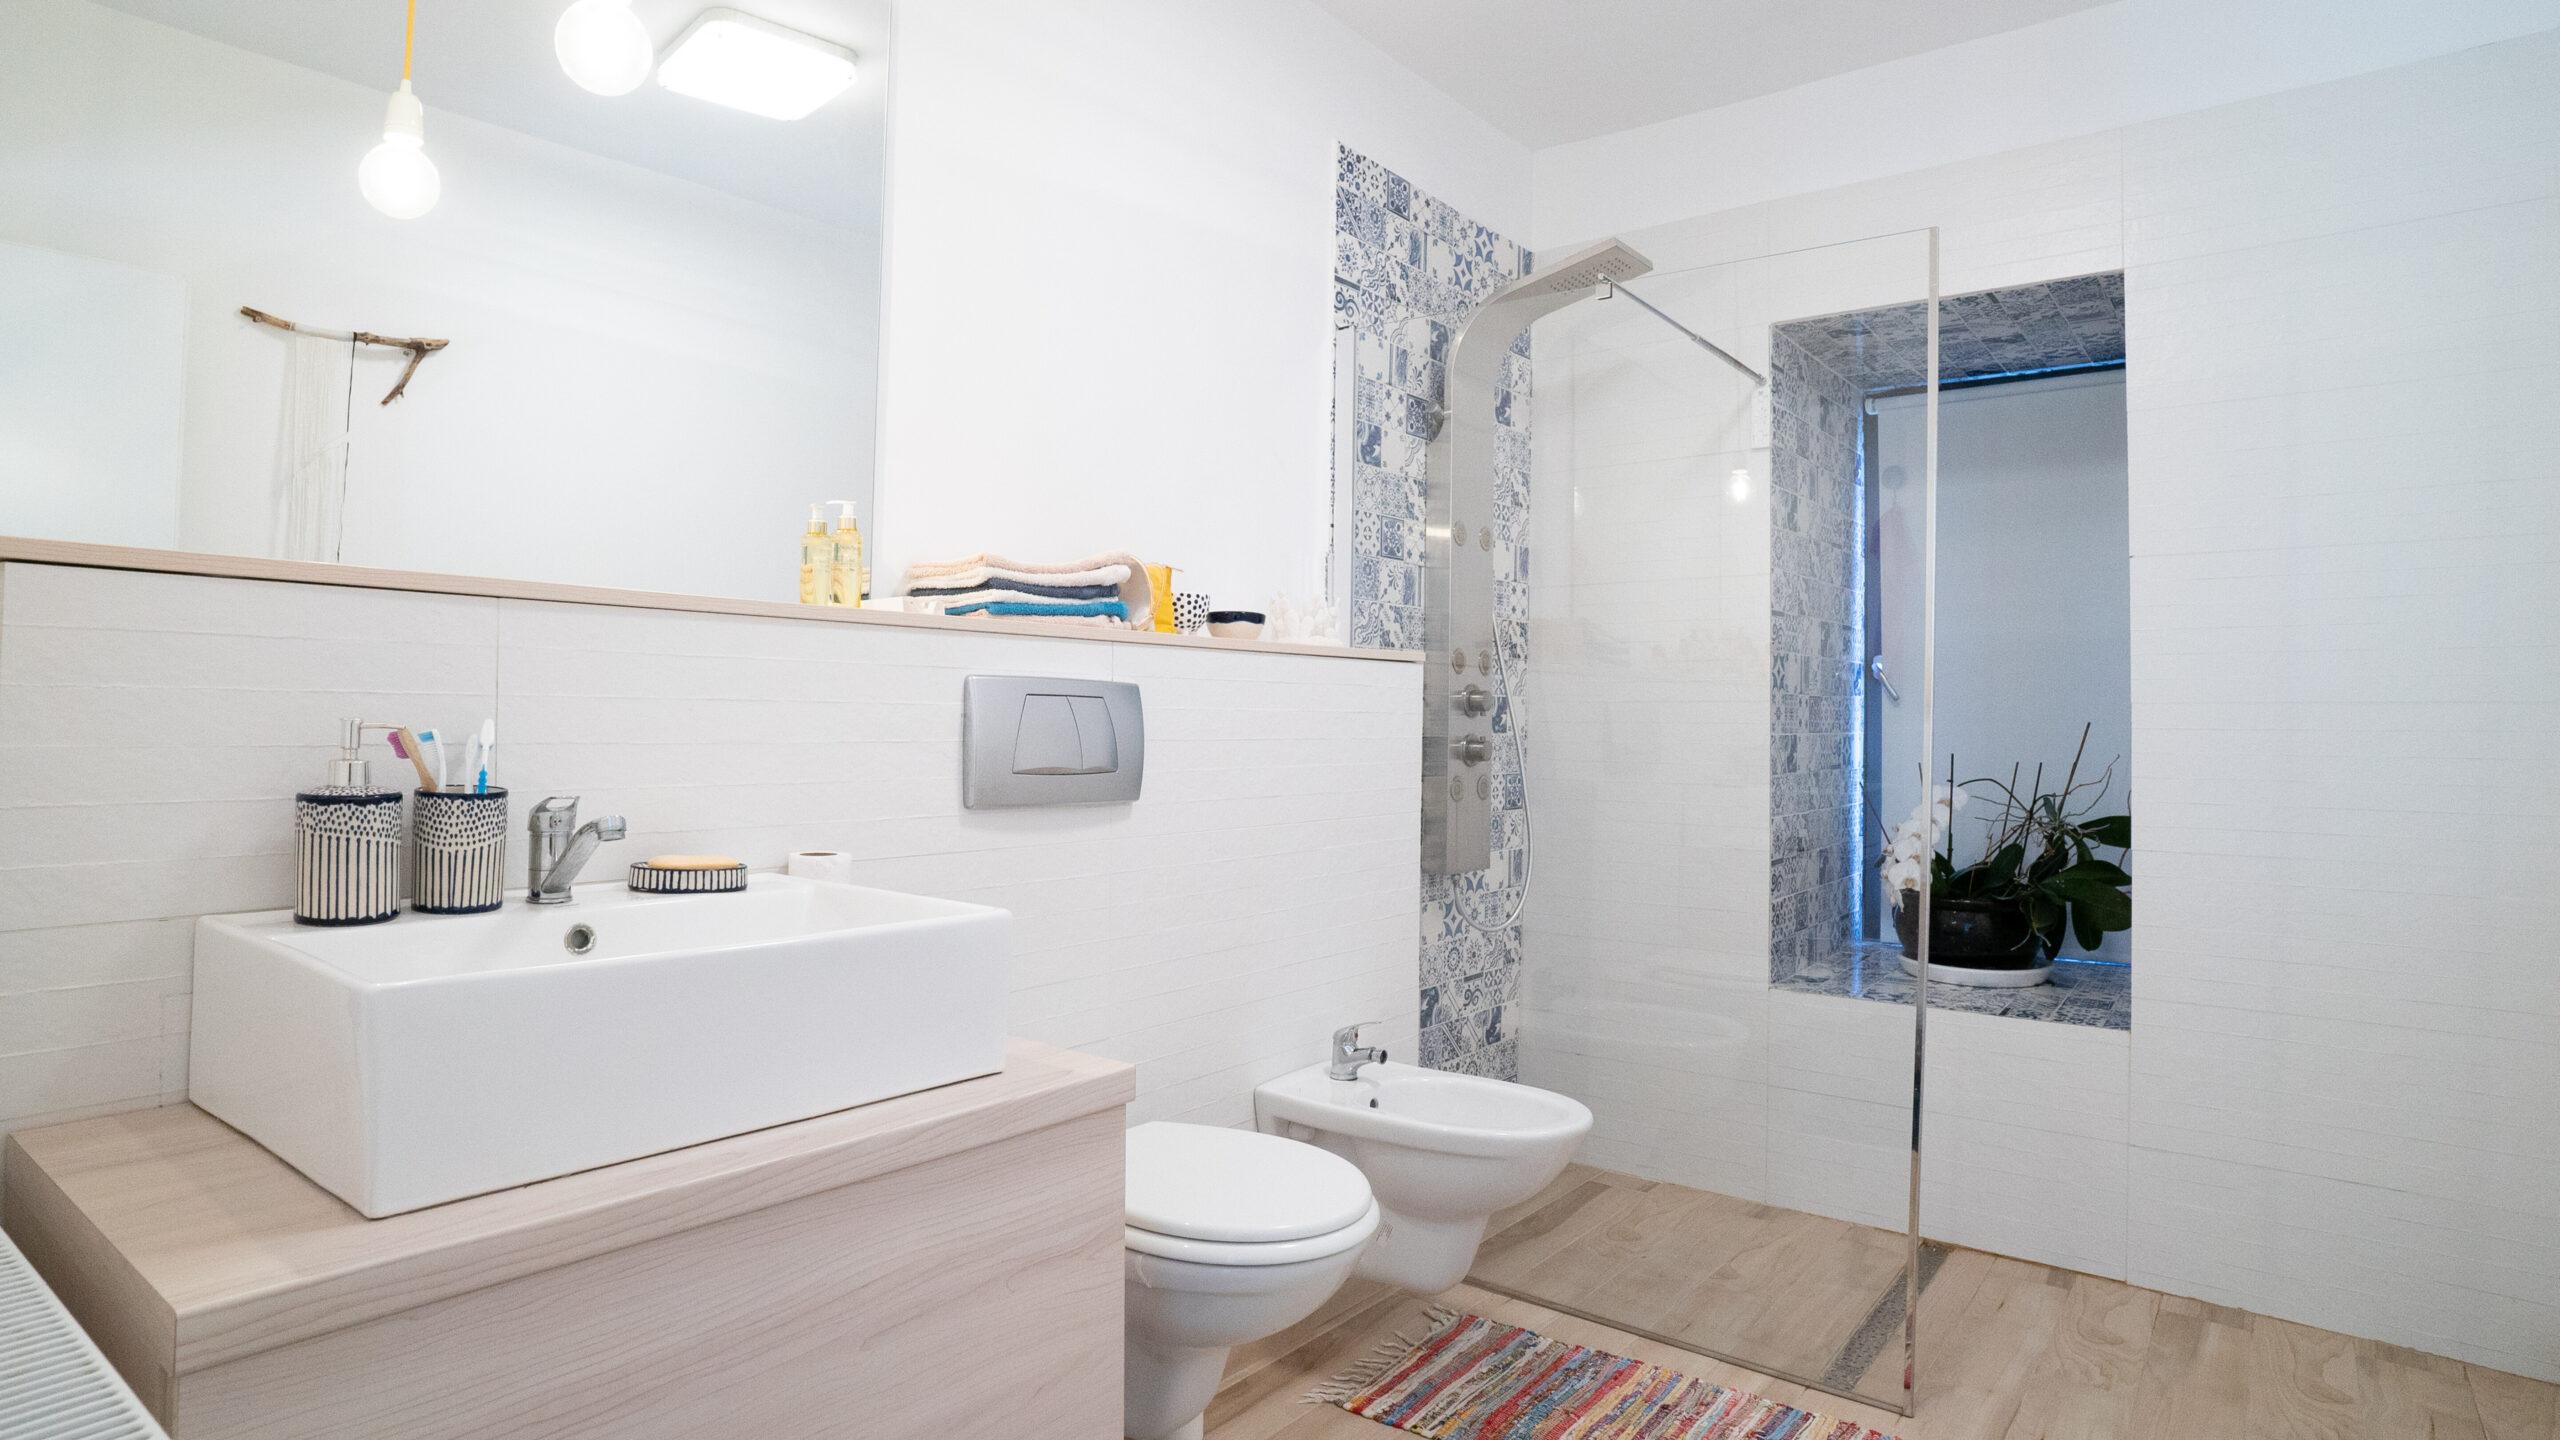 amenajare casă Izvorani baie duș oglindă